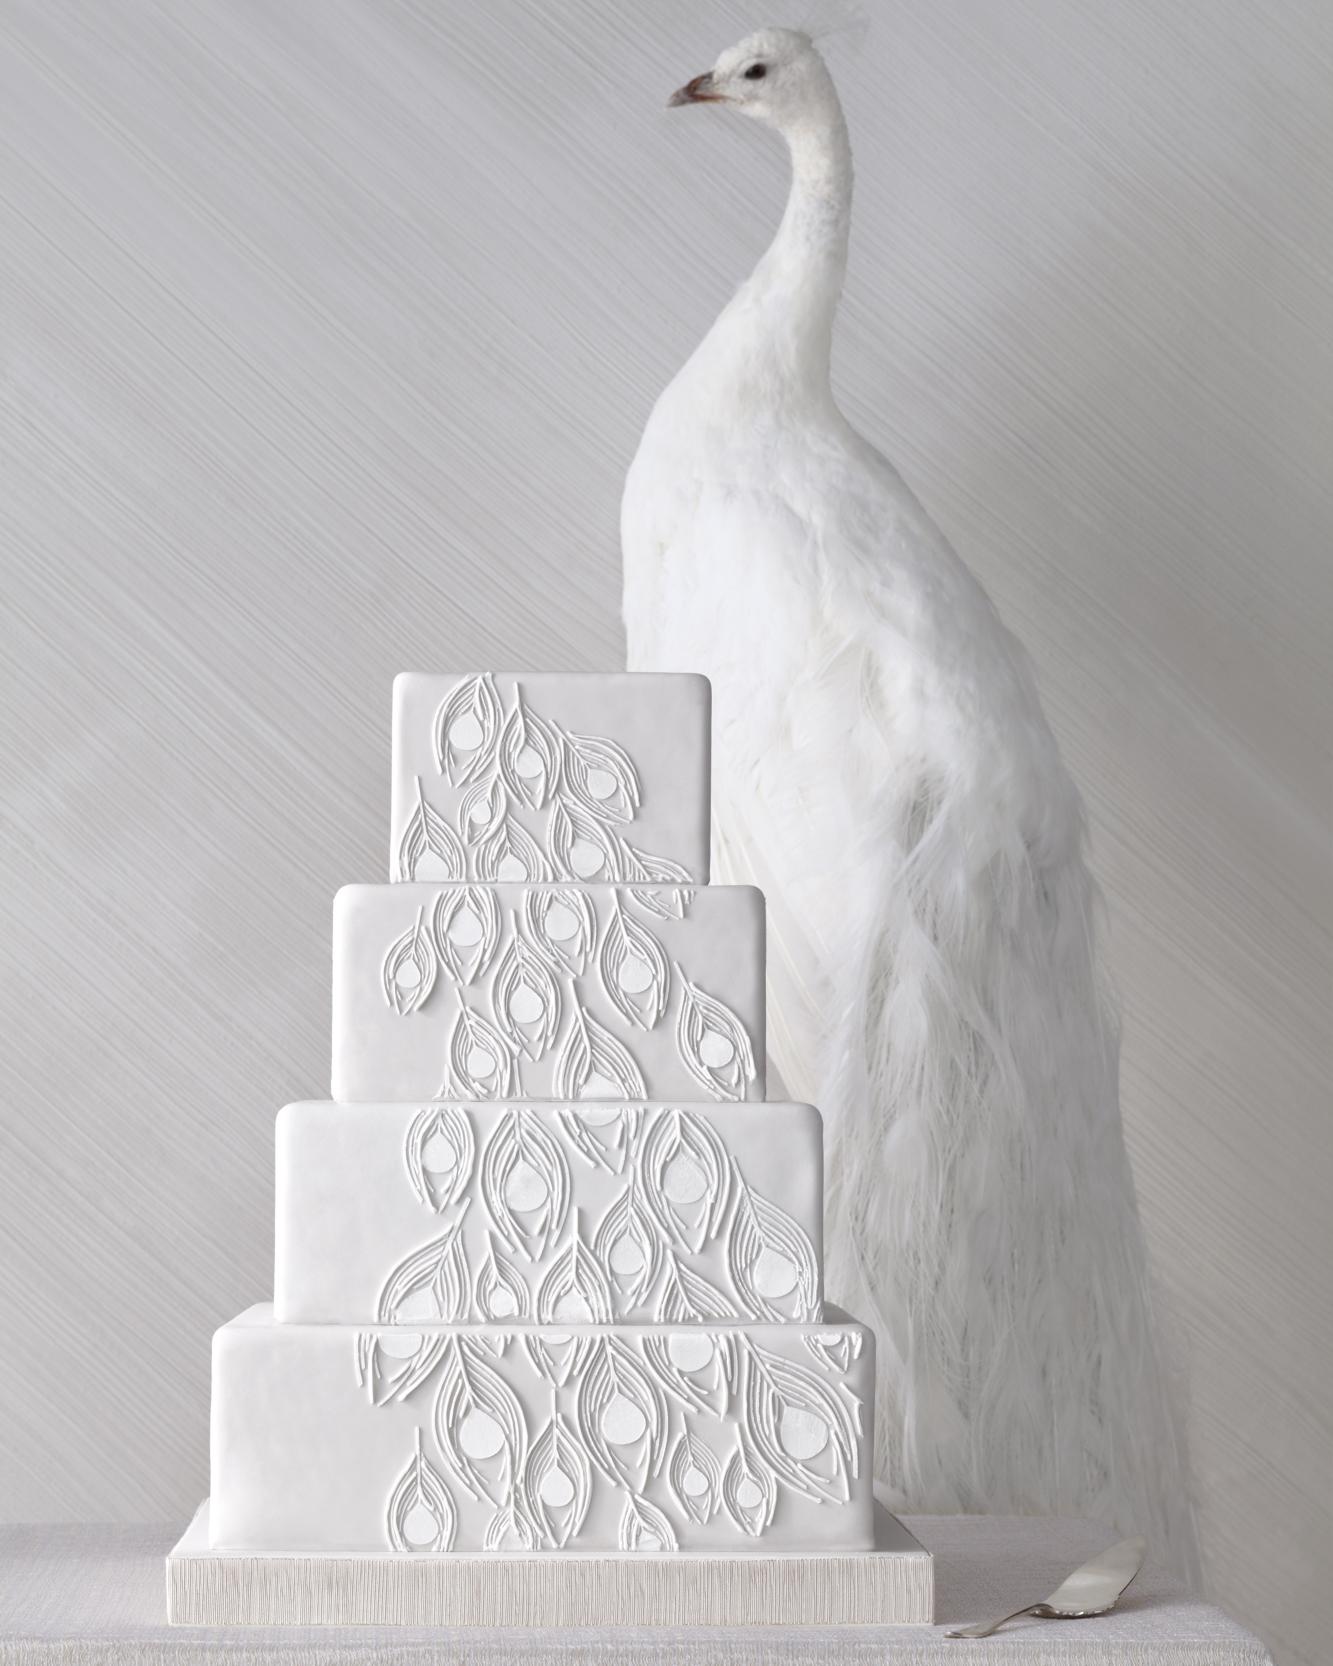 wedding-cakes-07-mwd108904.jpg